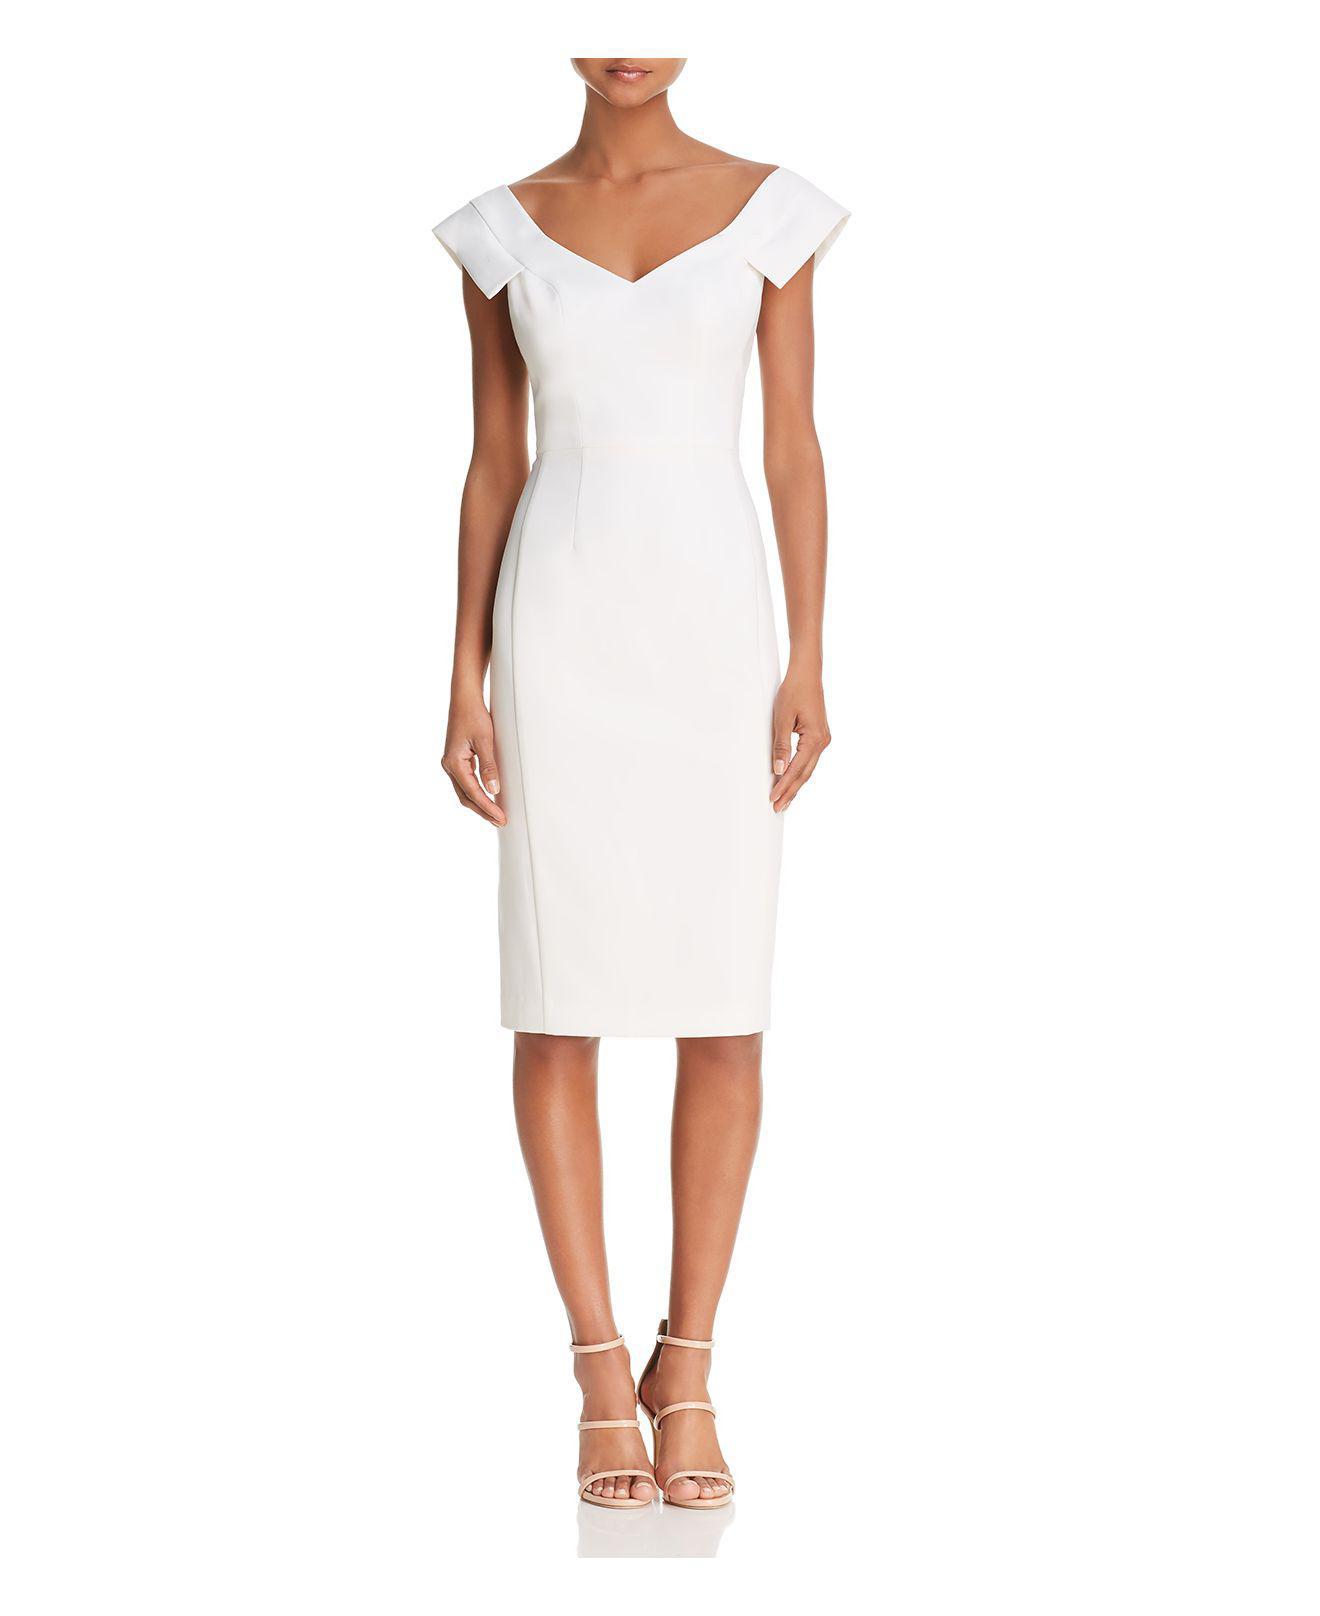 ruched midi dress - White Black Halo ohiFFLZh5N